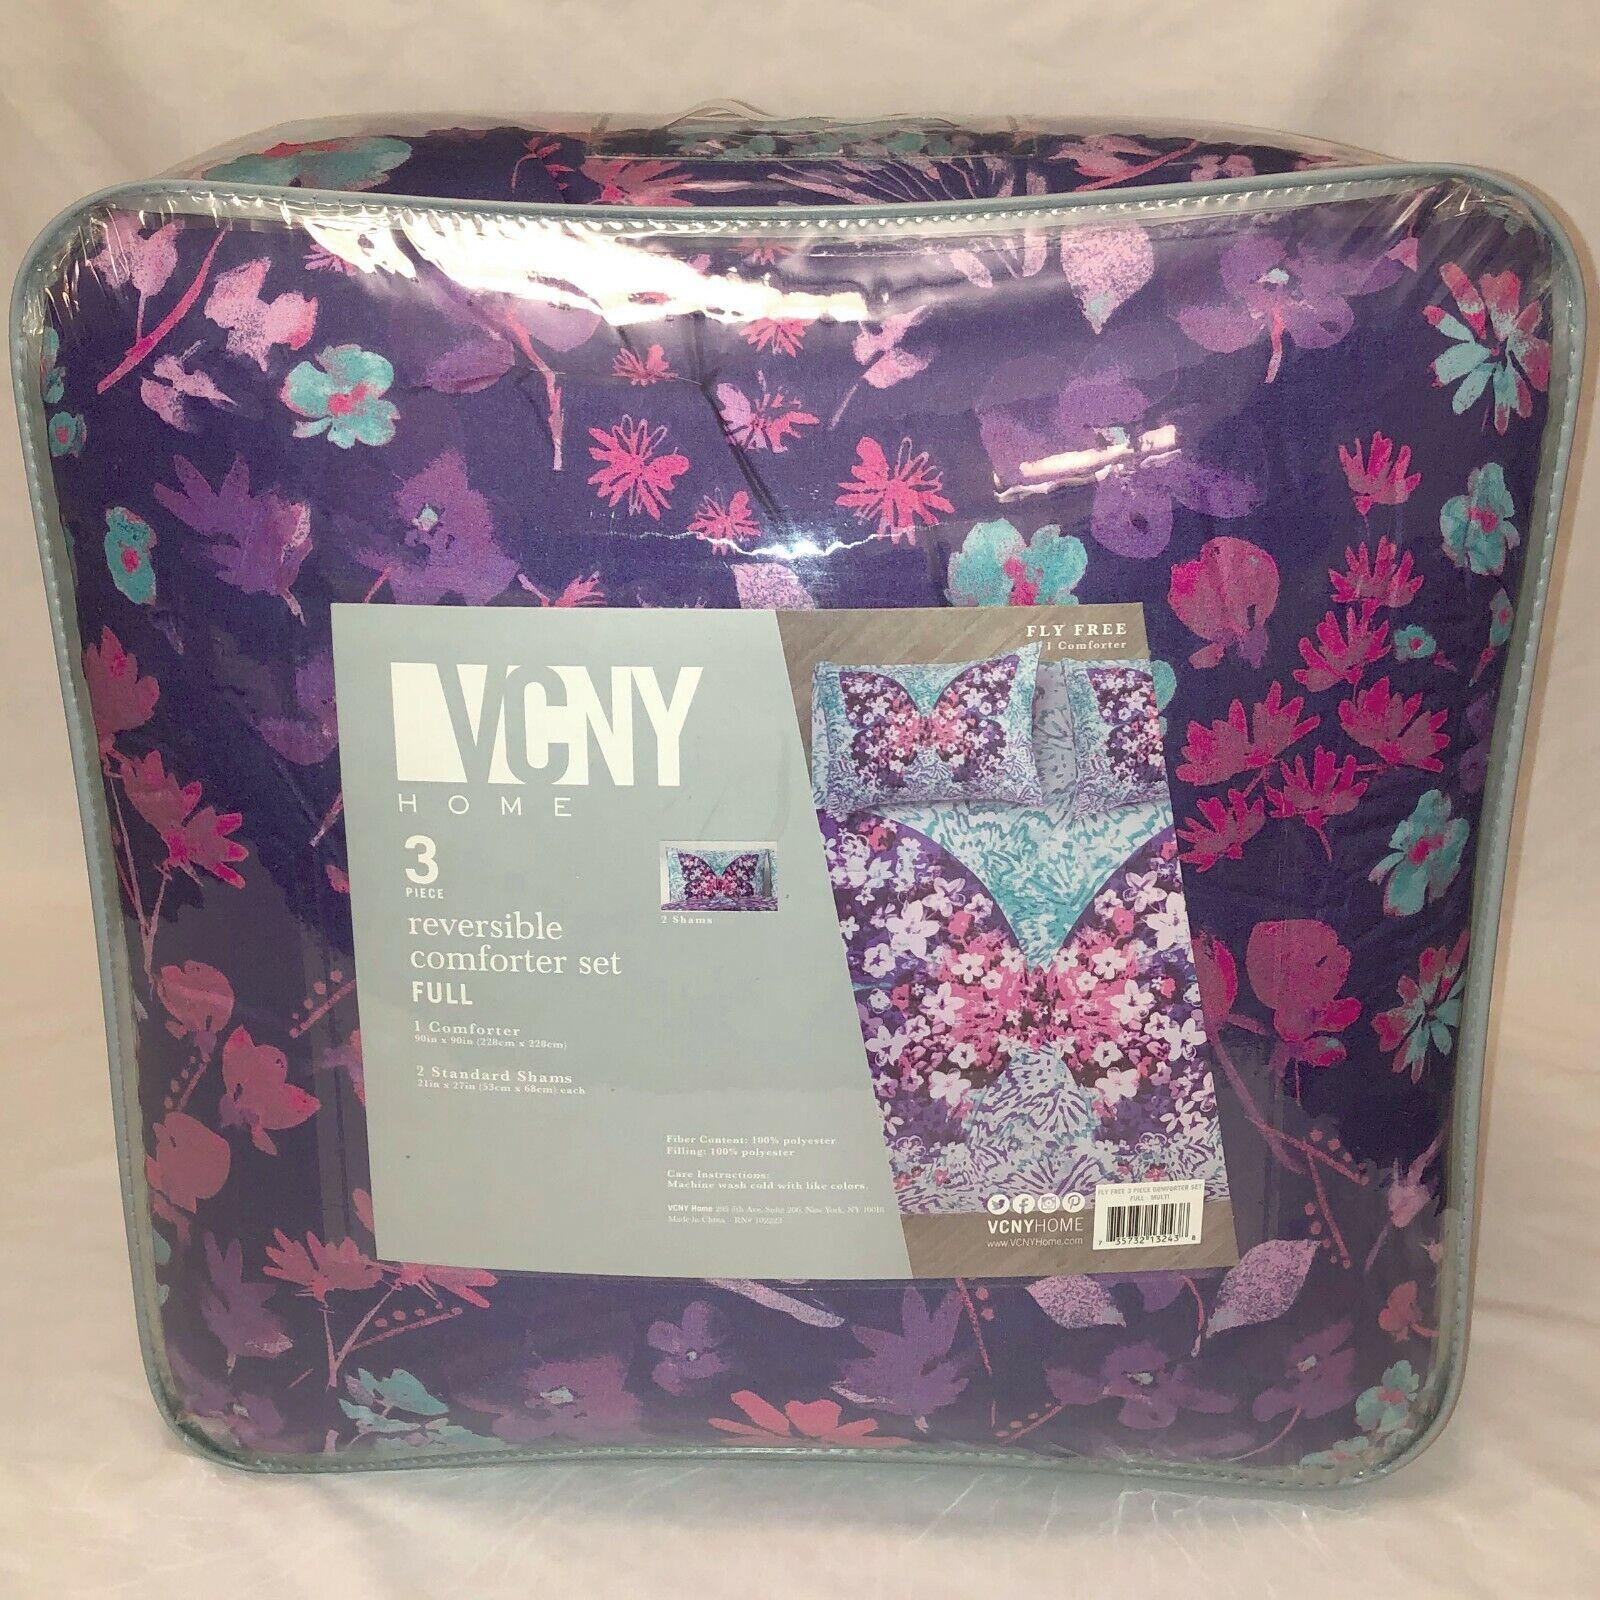 VCNY Home Full Größe Fly Free Reversible Comforter Set Butterfly lila Floral